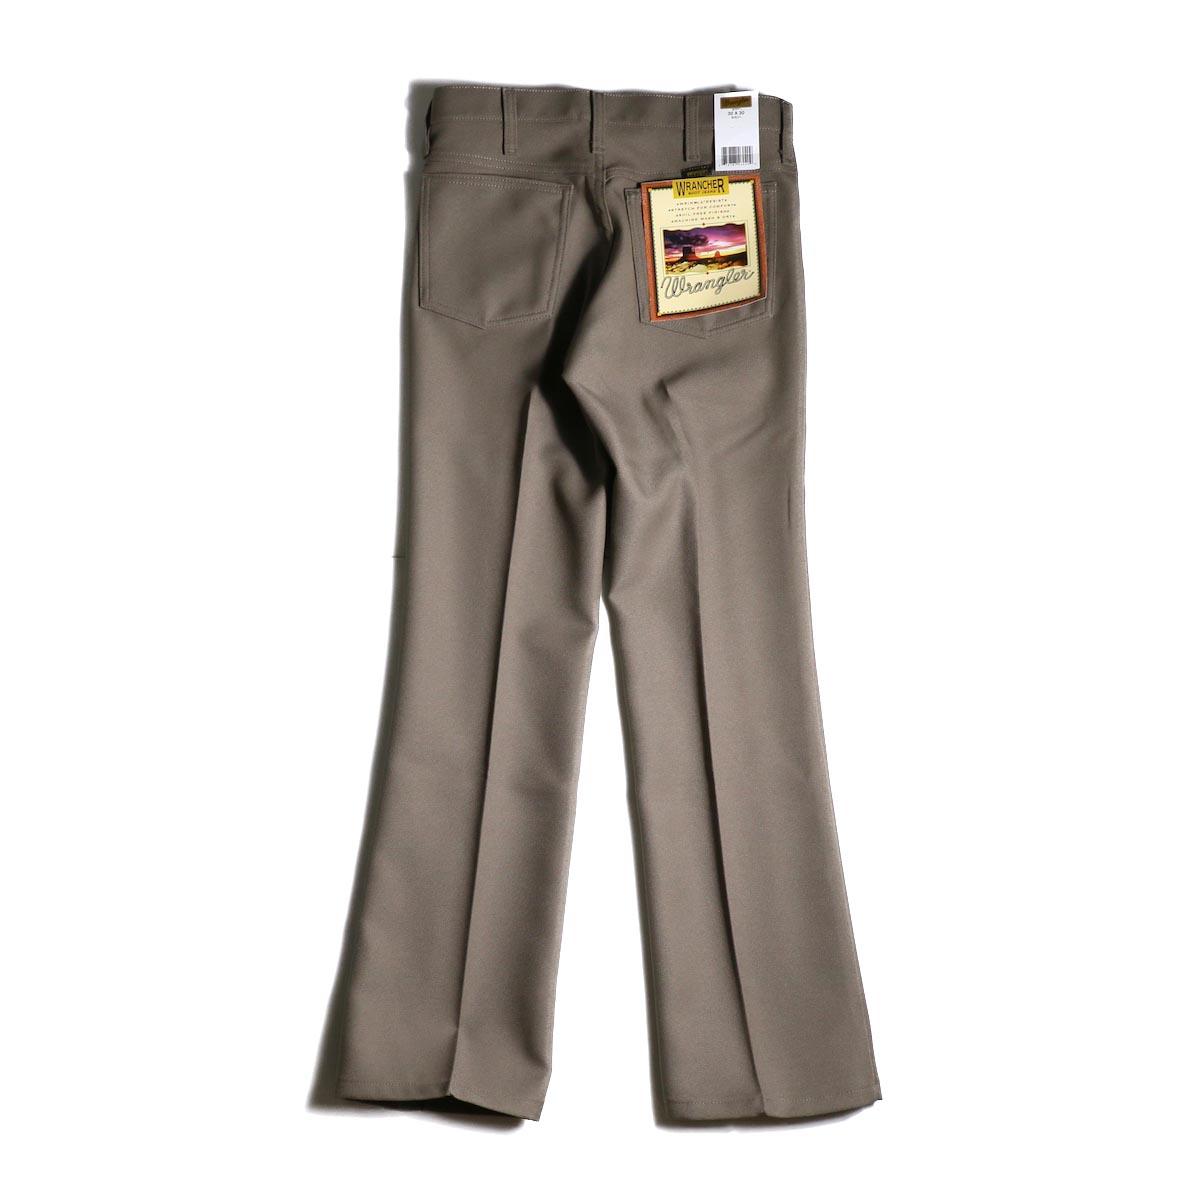 Wrangler / WRANCHER DRESS JEANS (Birch)背面